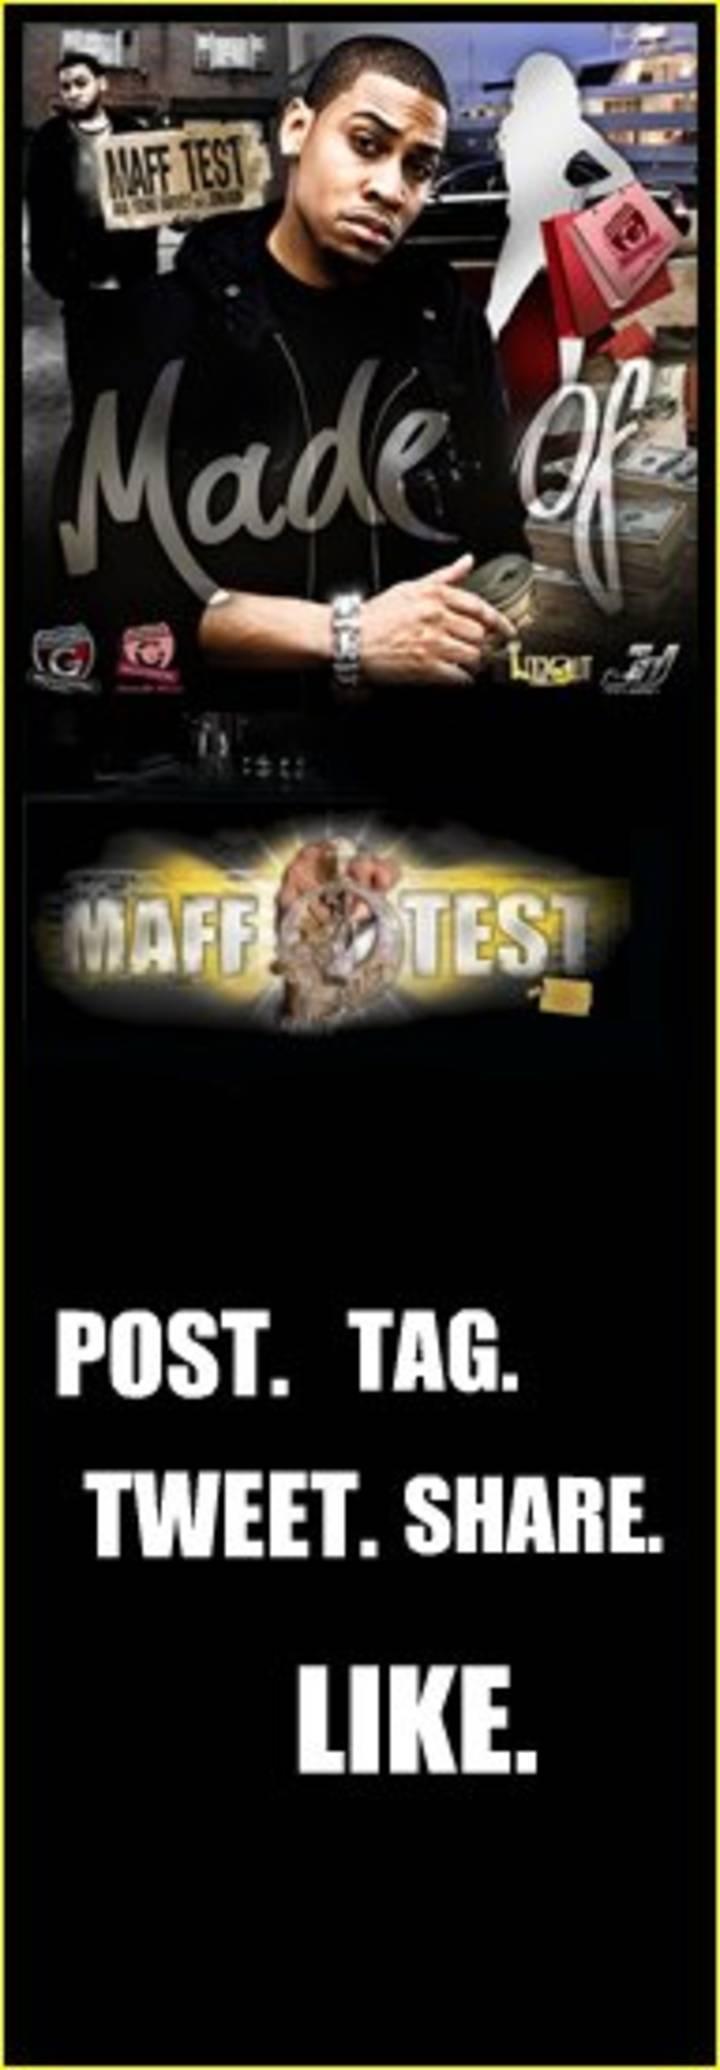 Maff Test a.k.a. young harvey Tour Dates